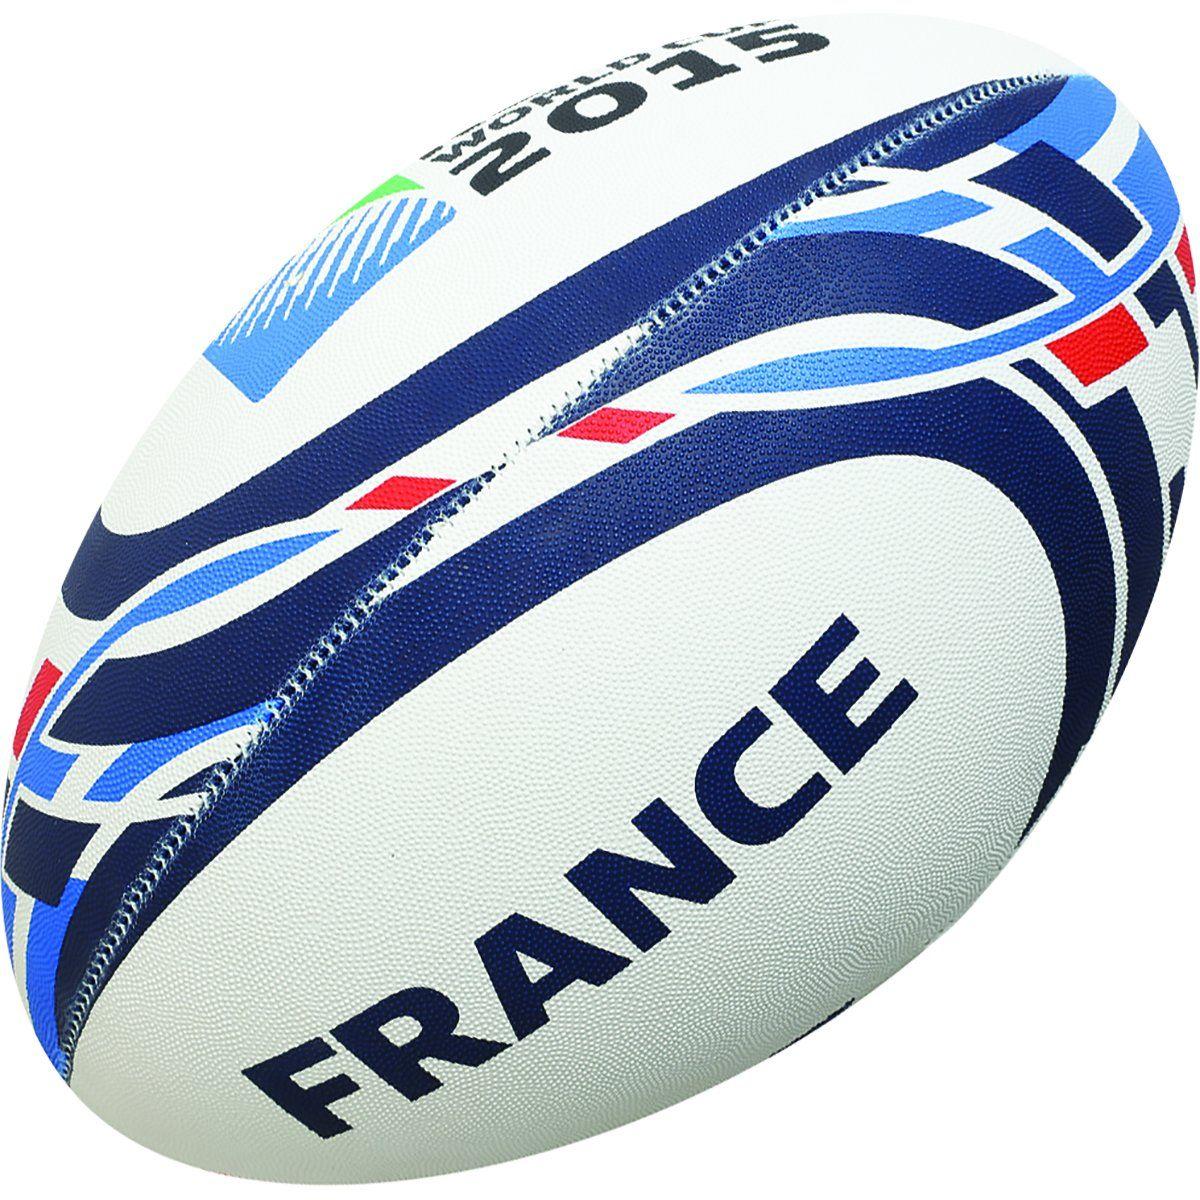 meilleures chaussures produit chaud magasin en ligne GILBERT Rugby World Cup 2015 FRANCE Ballon de Rugby de ...